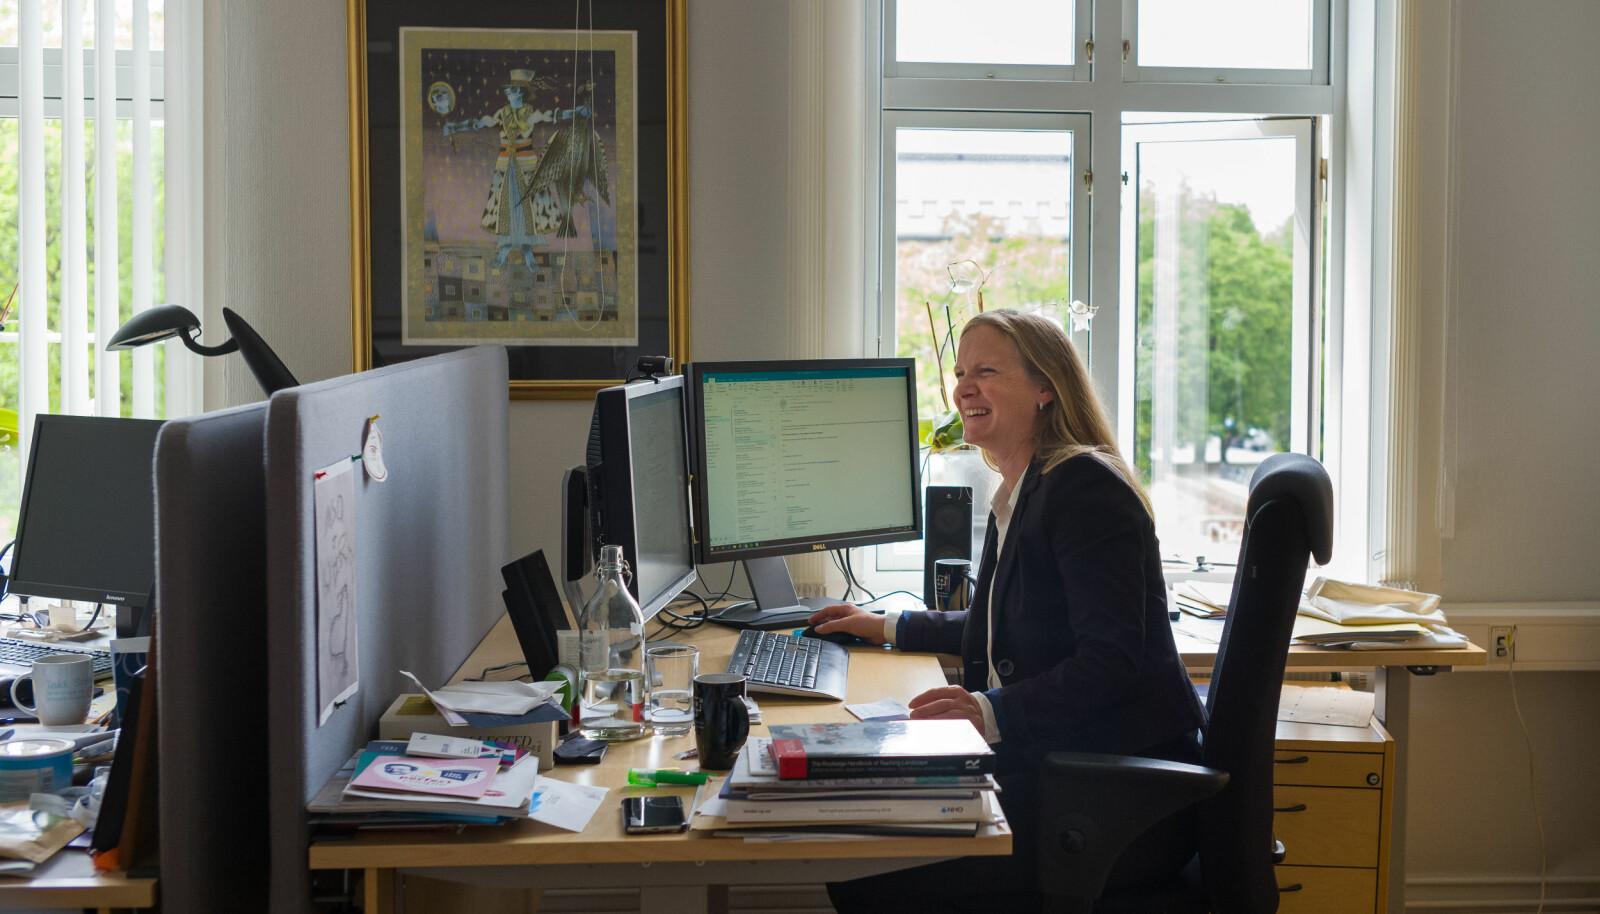 Mari Sundli Tveit deler kontor med sine to prorektorer. — Dere ser på kontoret hvor prioriteringene mine ligger, sier hun og ler. Foto: Siri Øverland Eriksen